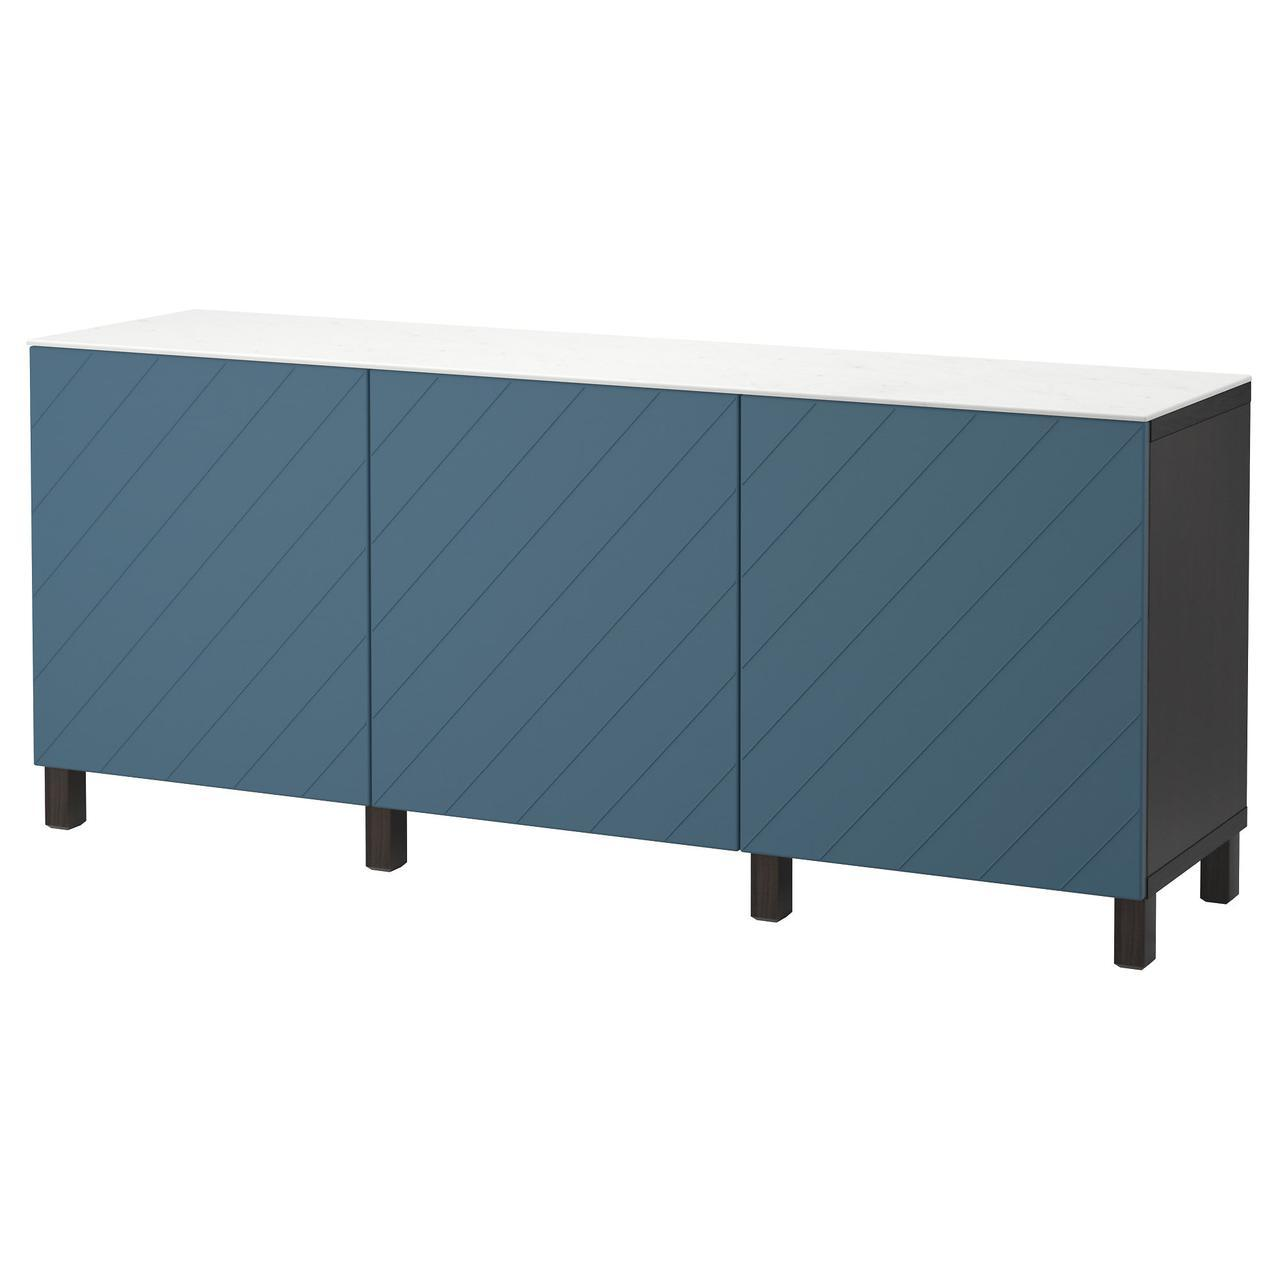 IKEA BESTA (992.096.75)Шкаф, белое, стекловолокно Glassvik